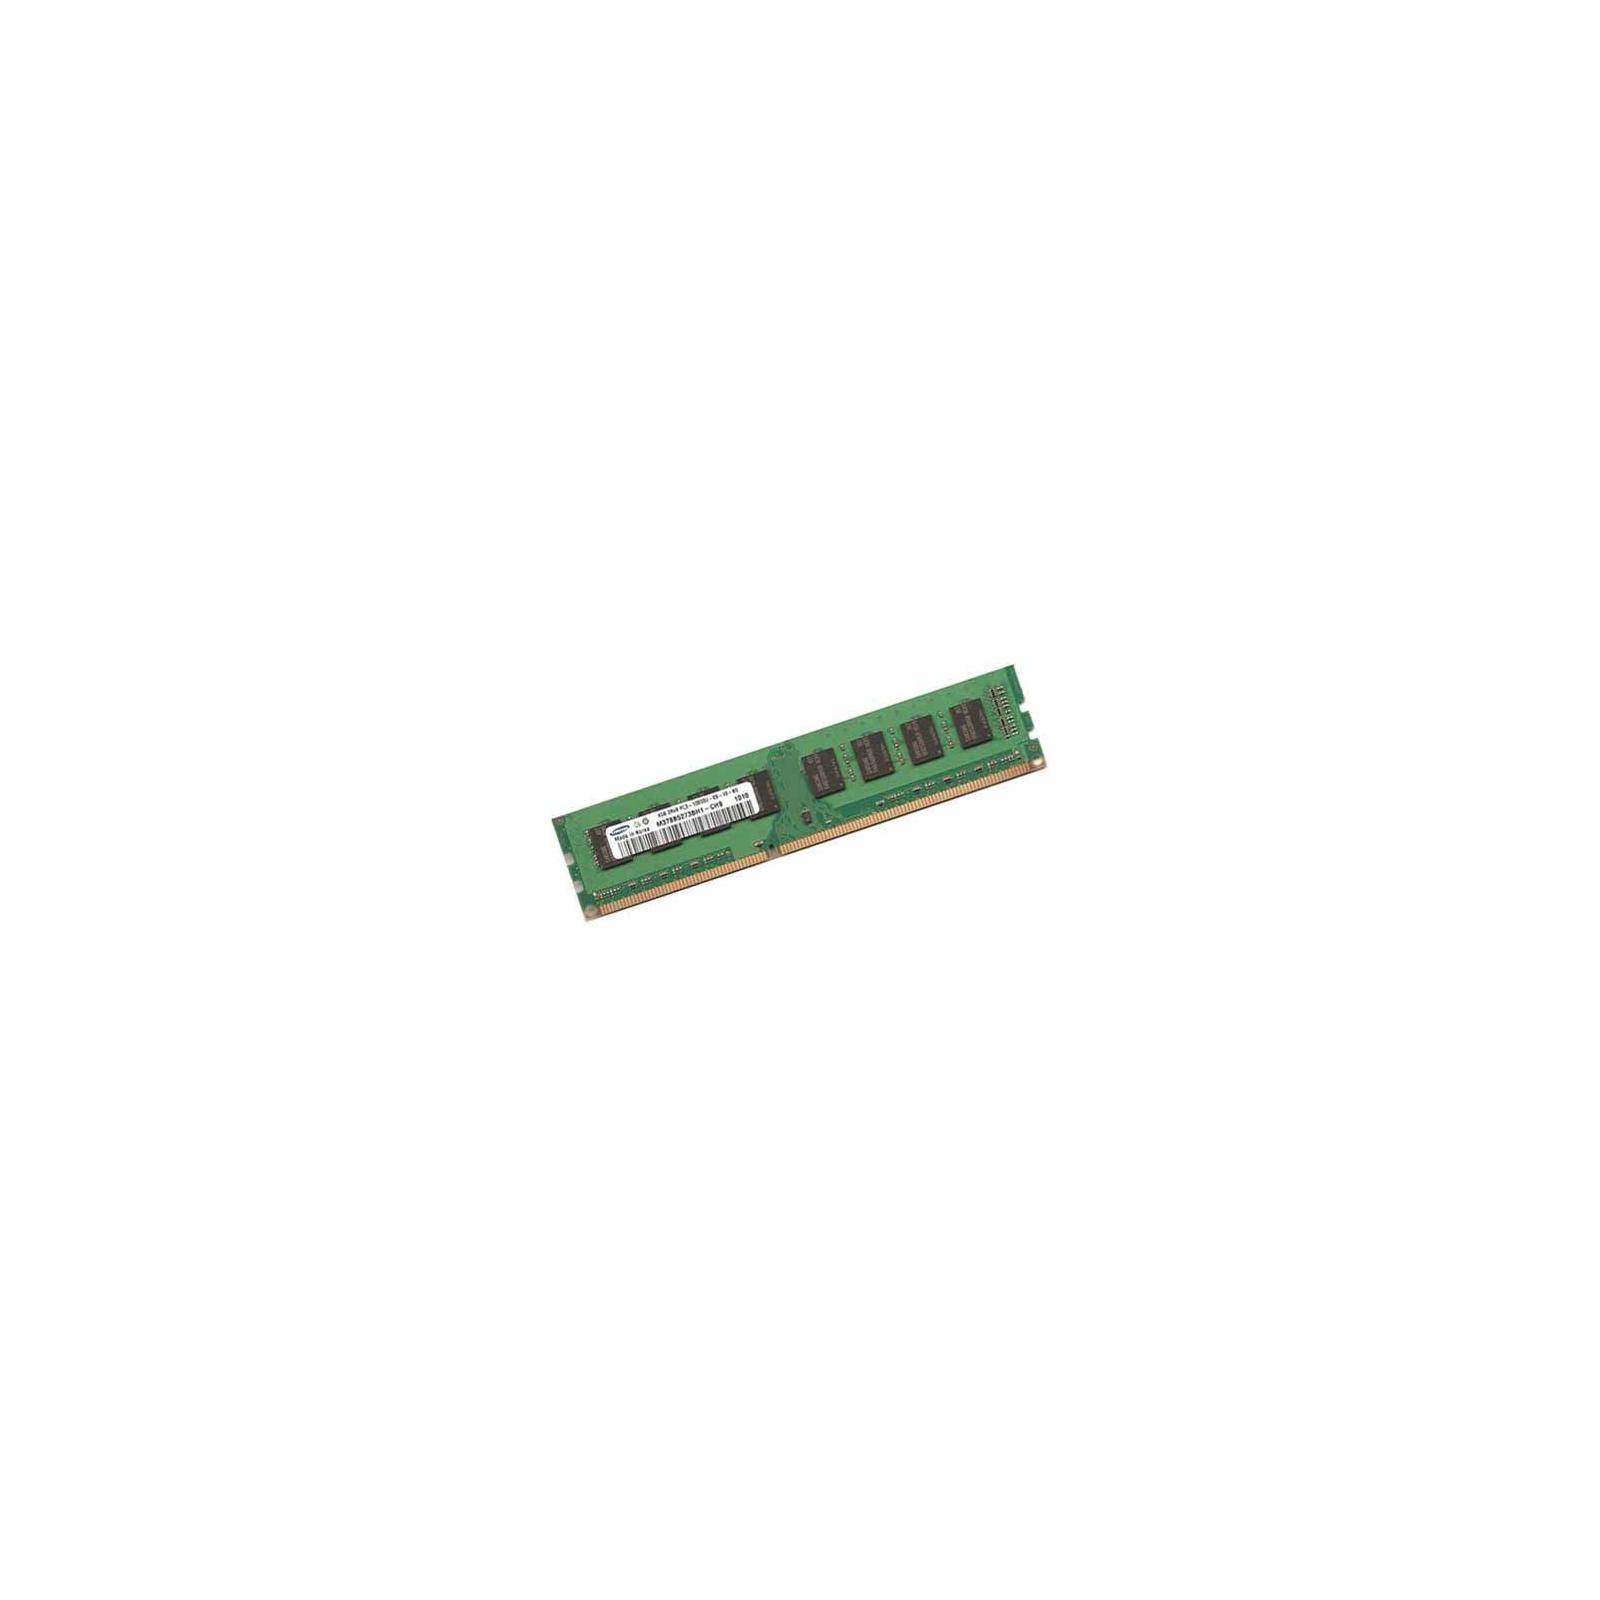 Модуль памяти для компьютера DDR3 4GB 1333 MHz Samsung (K4B4G0846C)